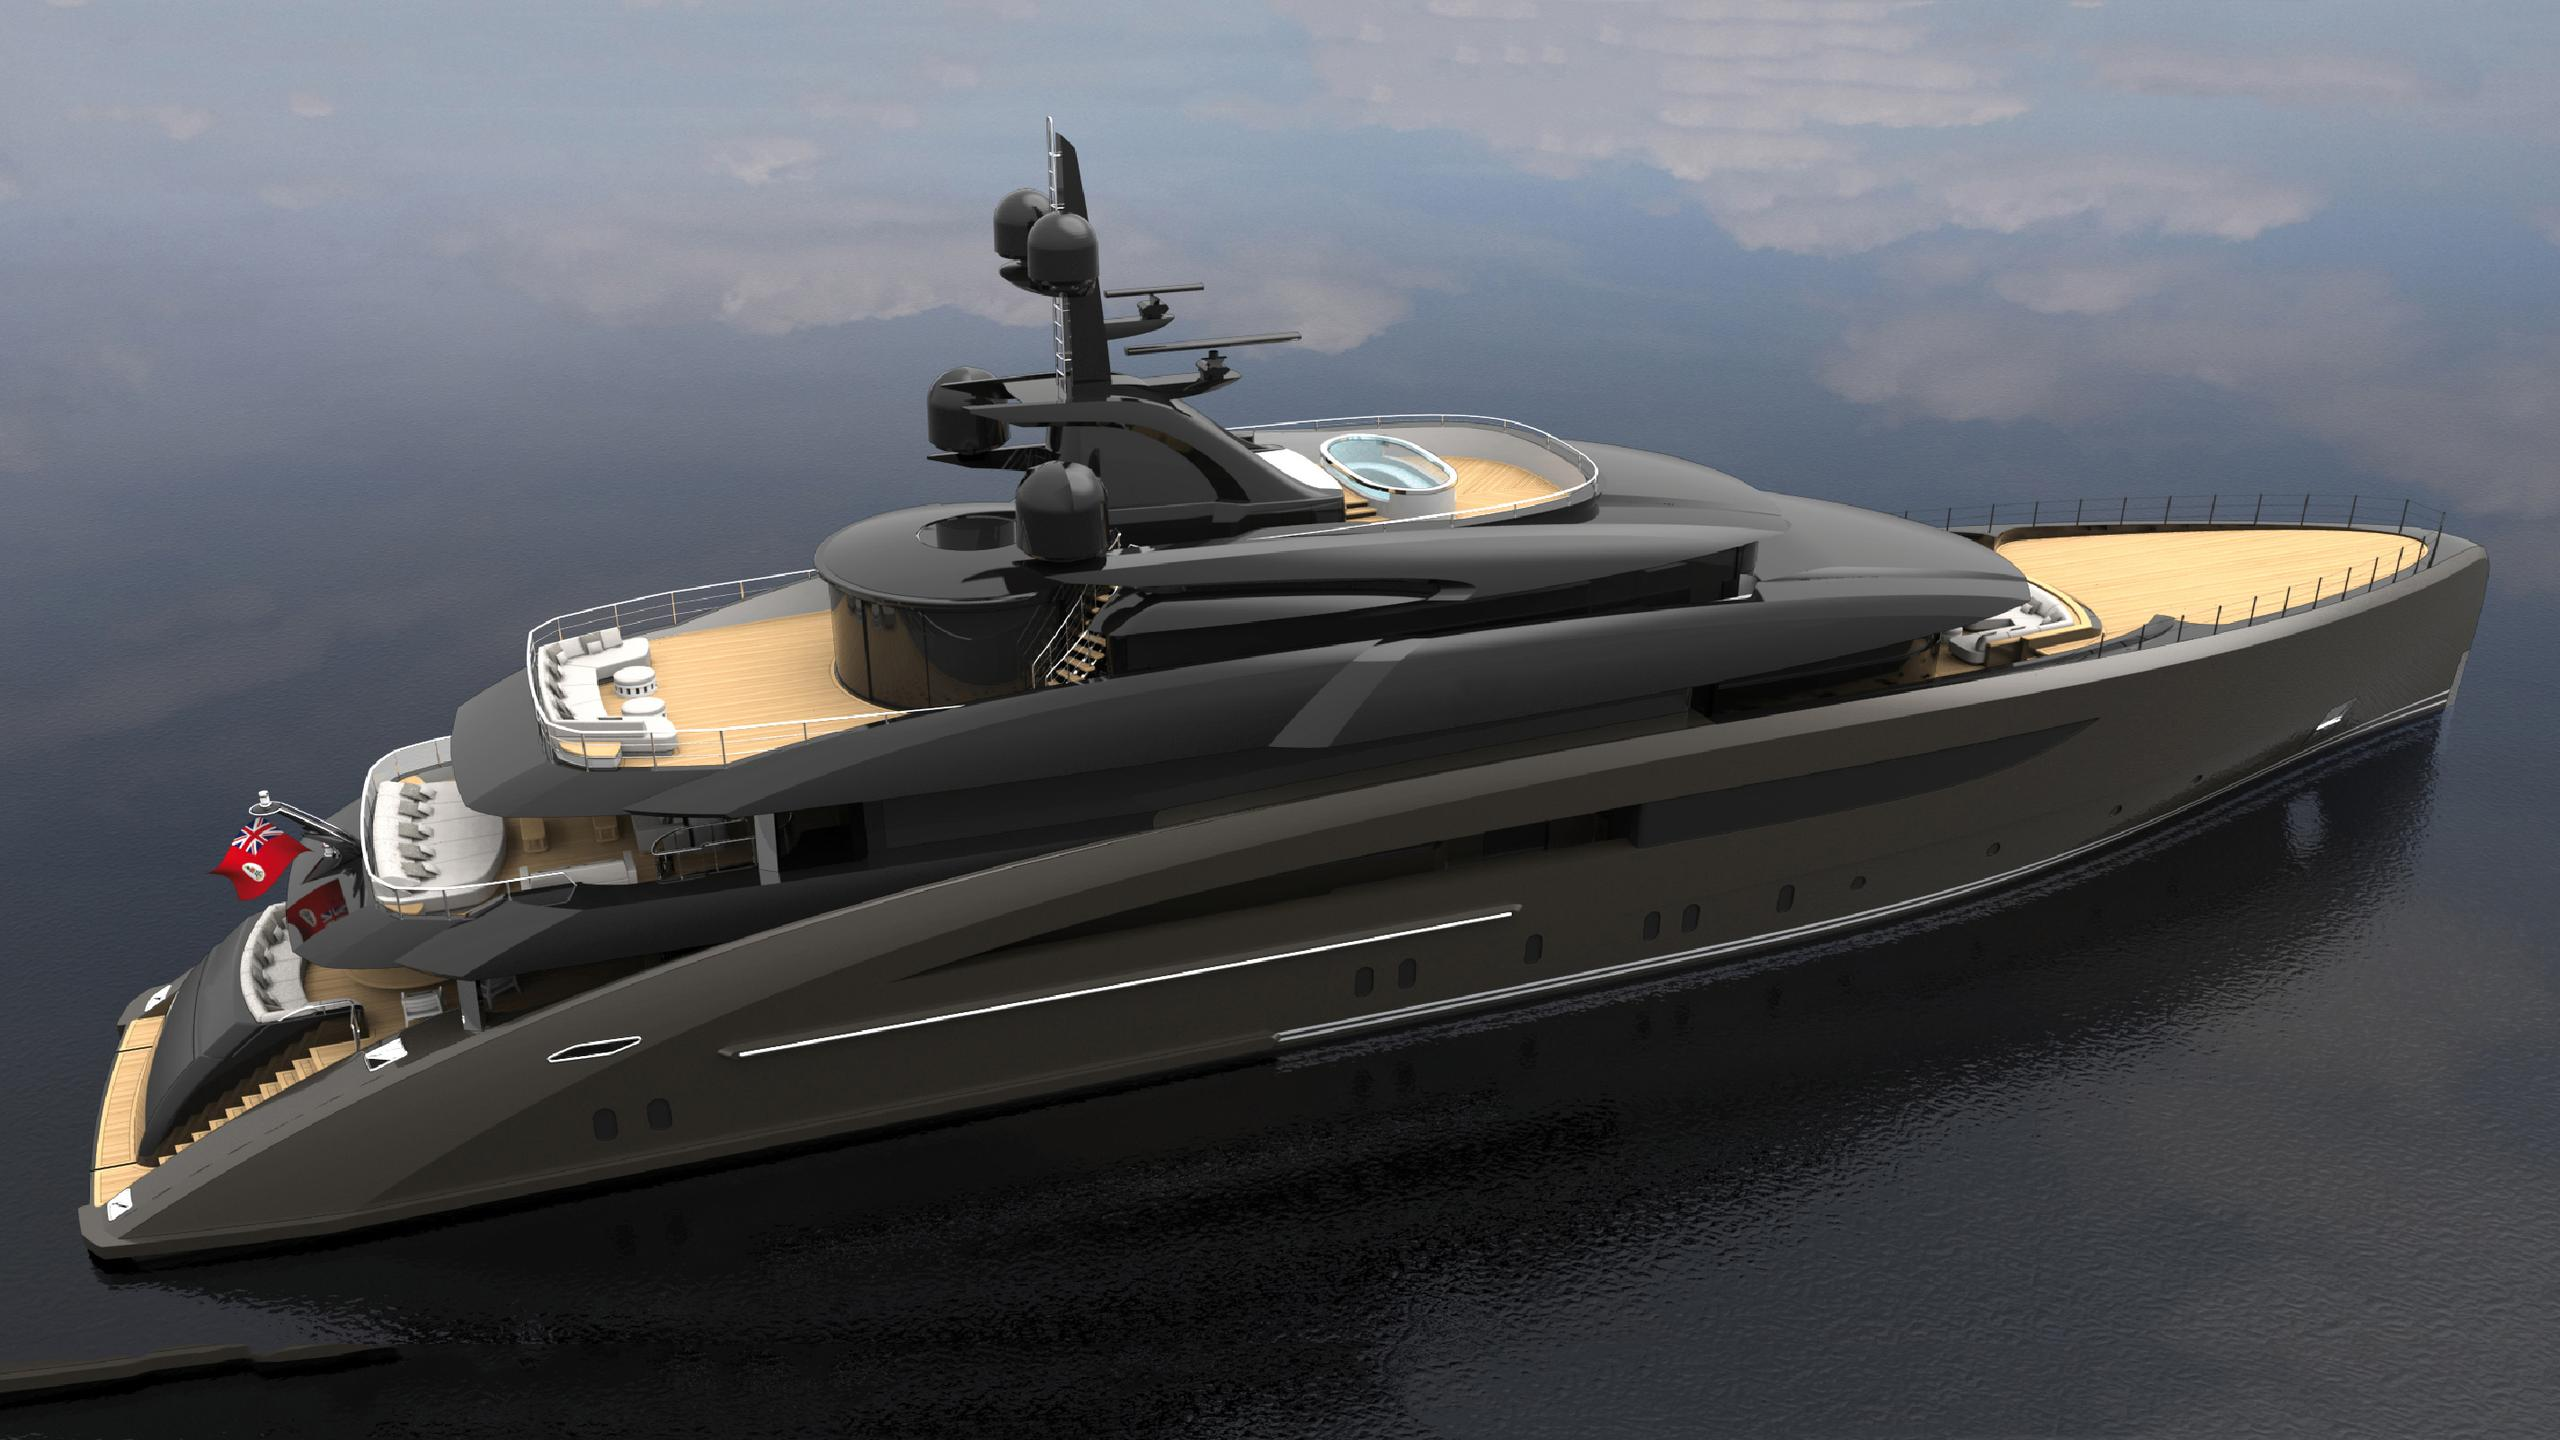 crn hull 137 motoryacht crn 2019 62m rendering